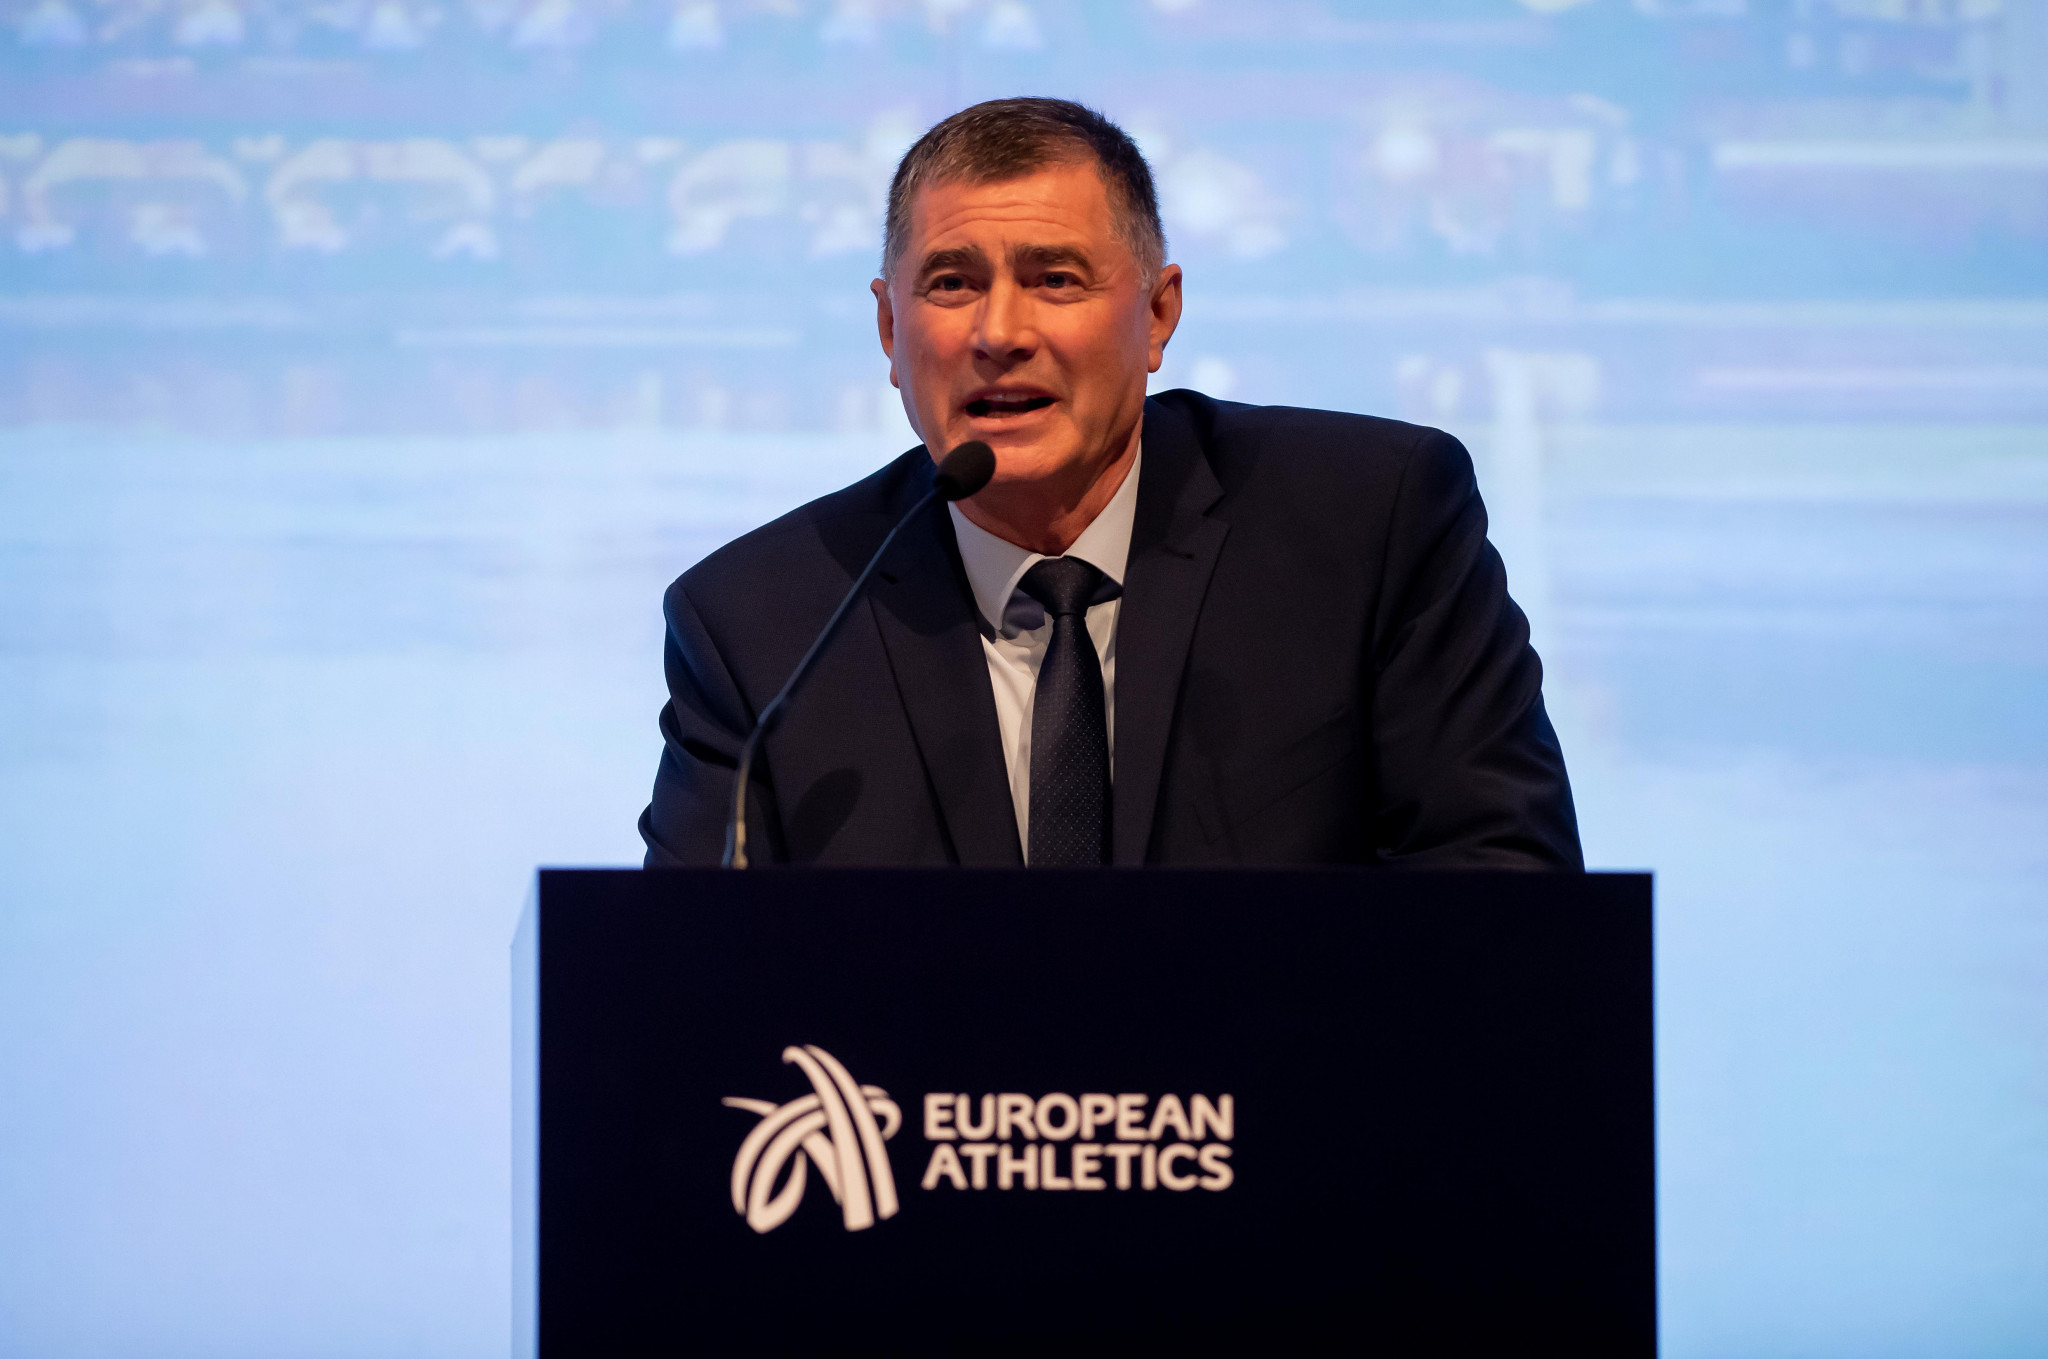 Interim President of European Athletics consults IOC over safeguarding athletes